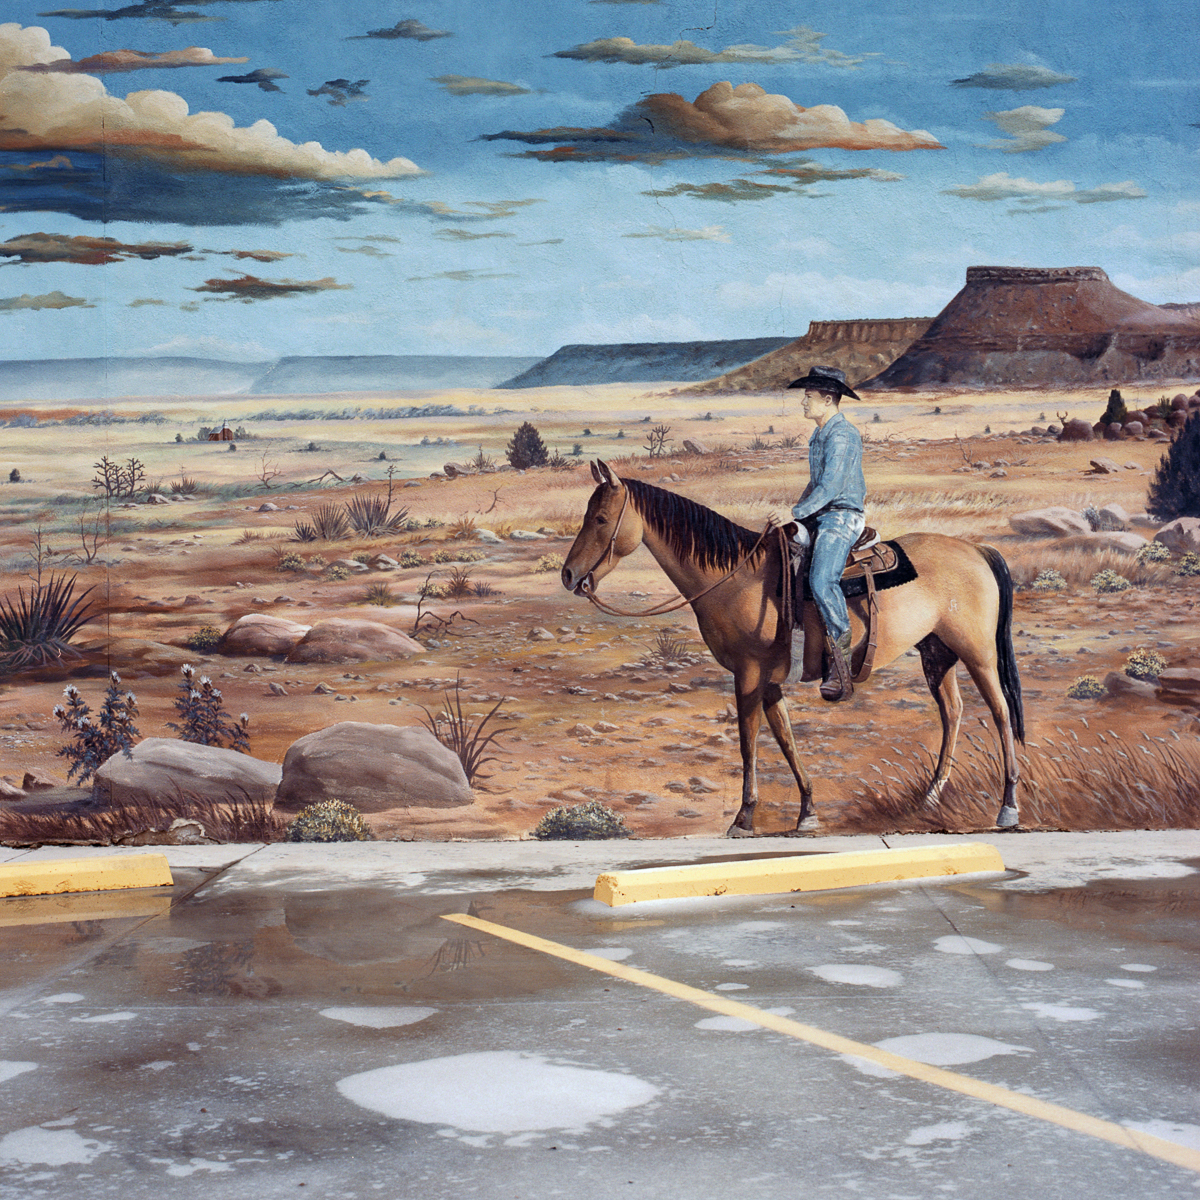 Valerie Chiang, Cowboy Mural, 2015